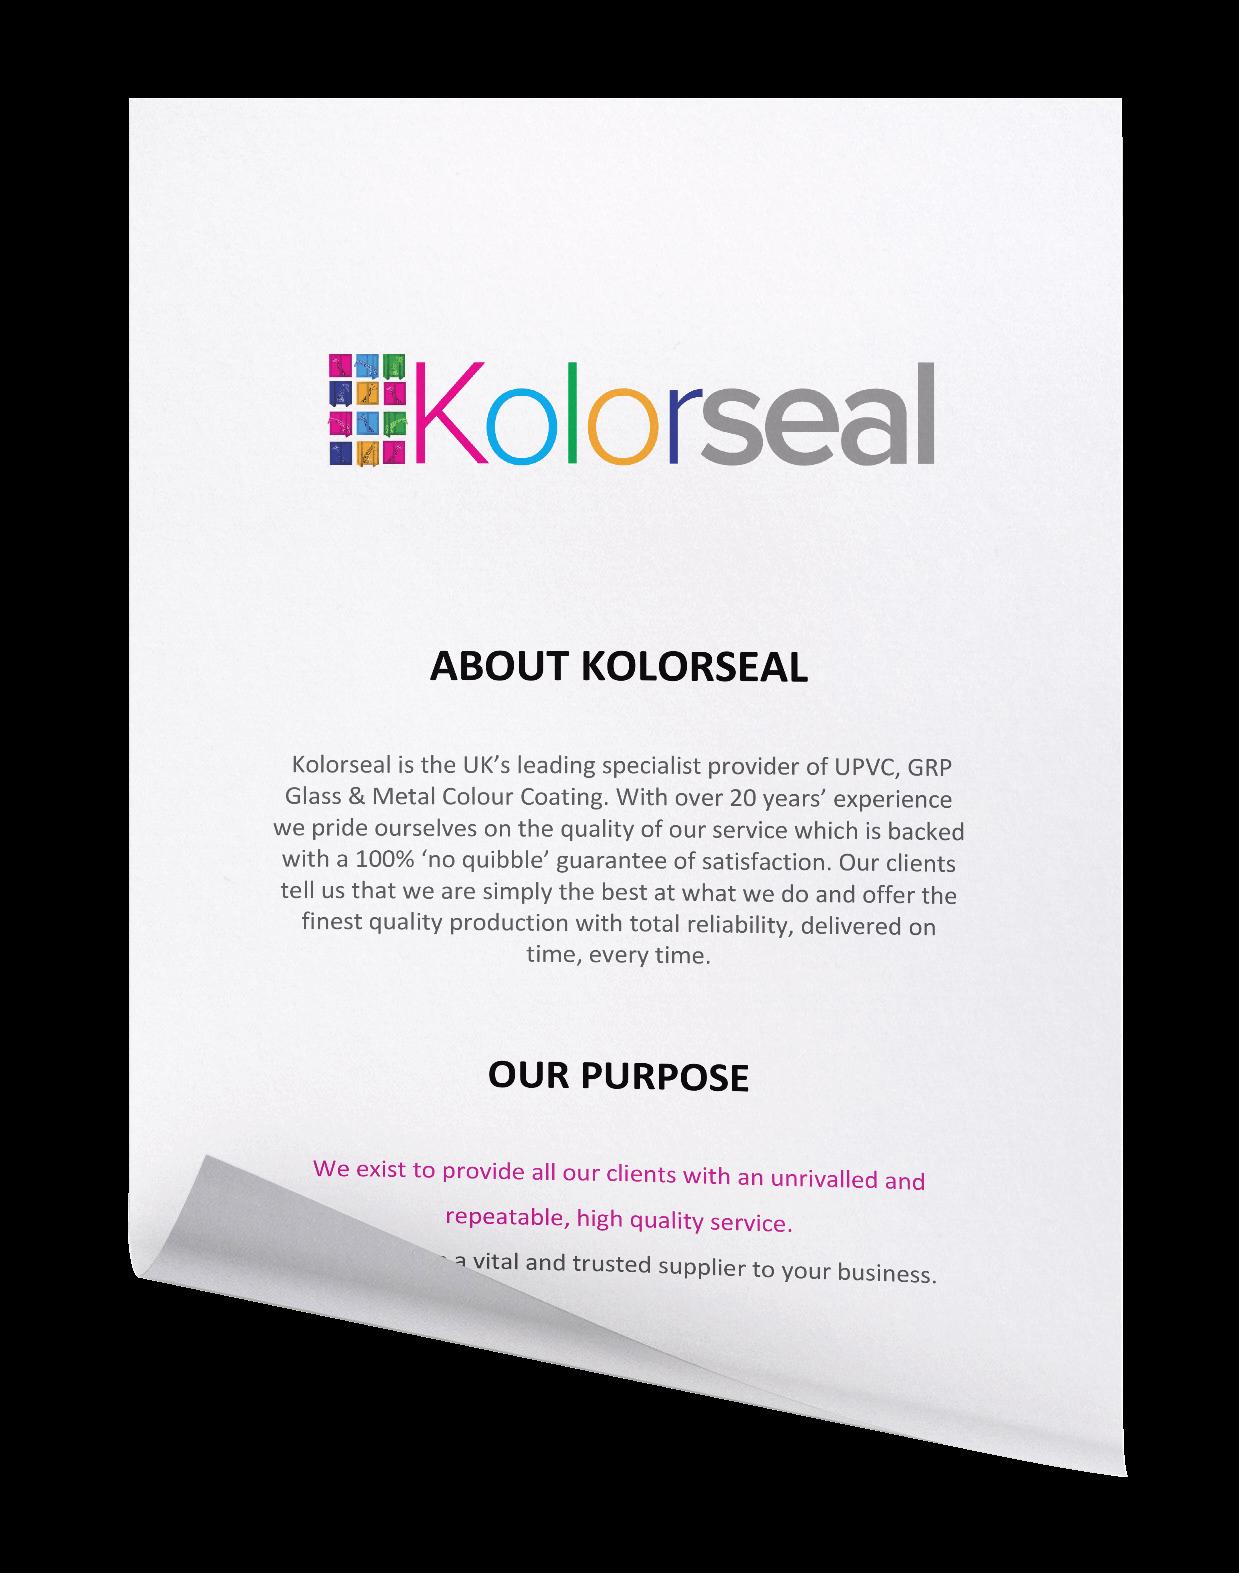 About Kolorseal